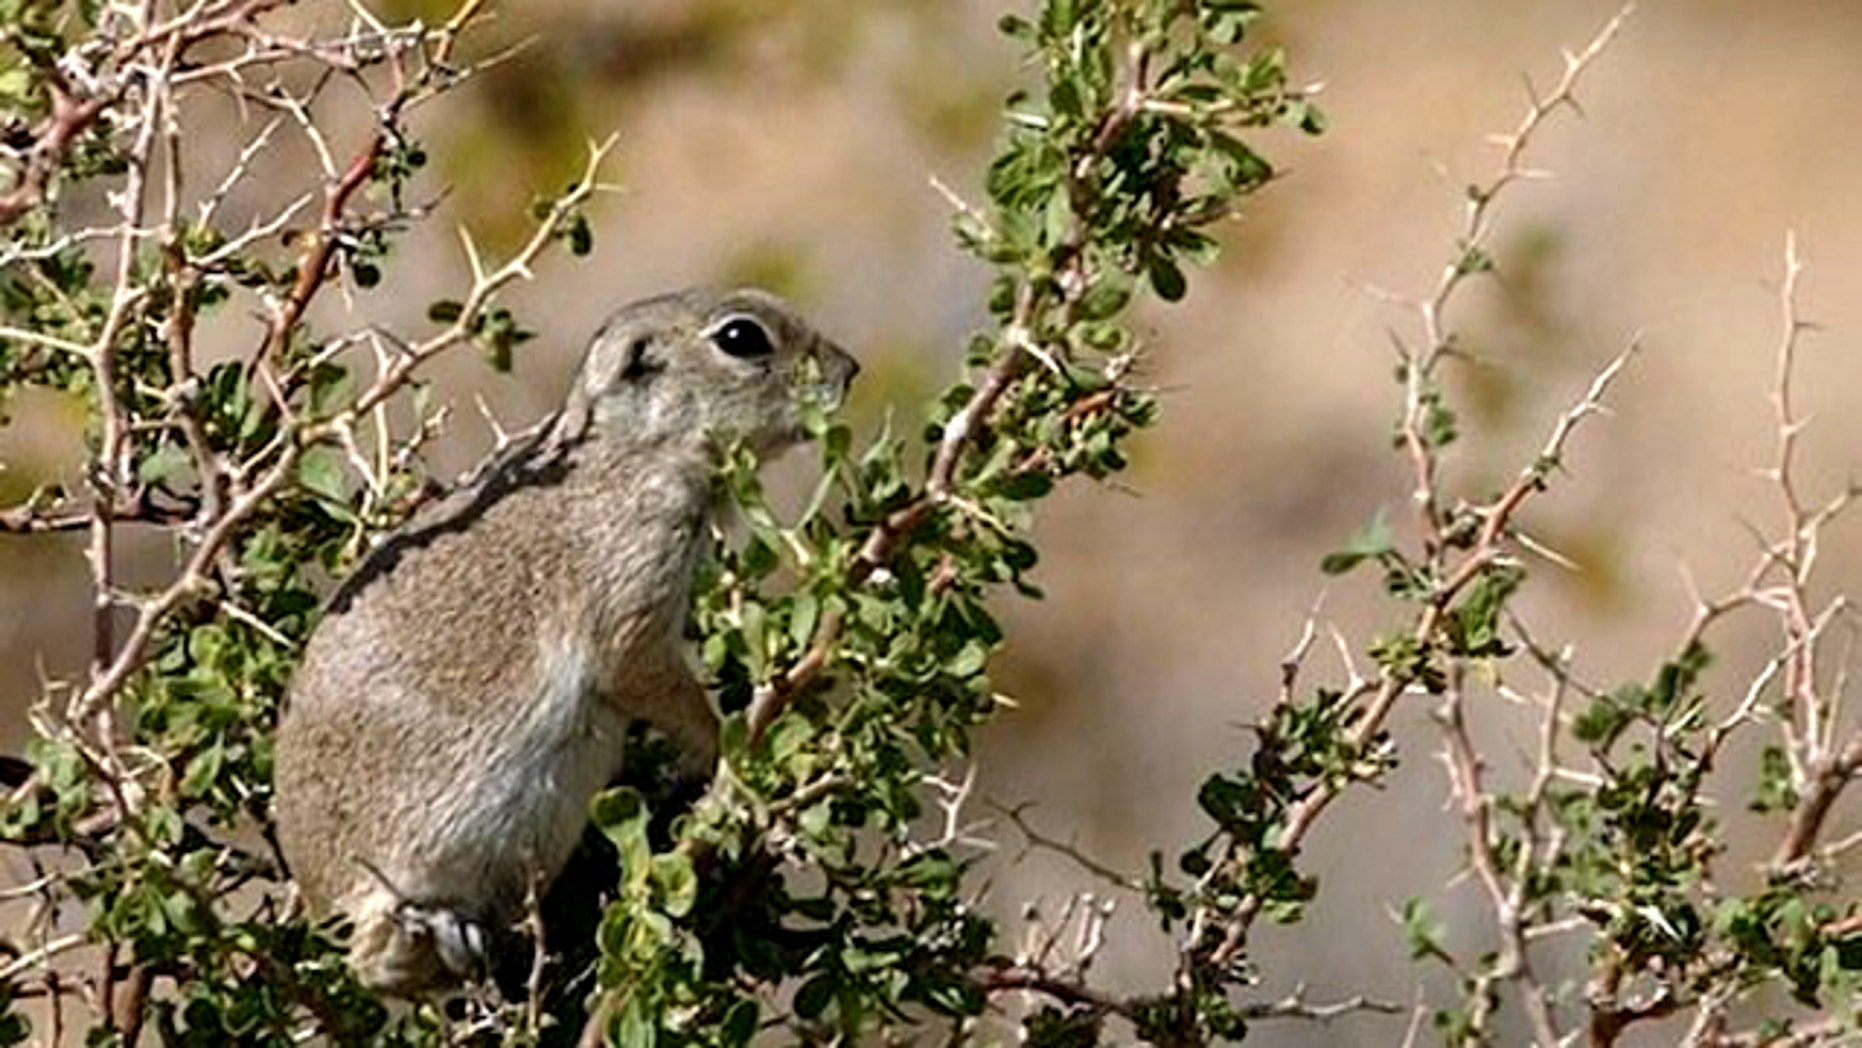 Mojave Ground Squirrel